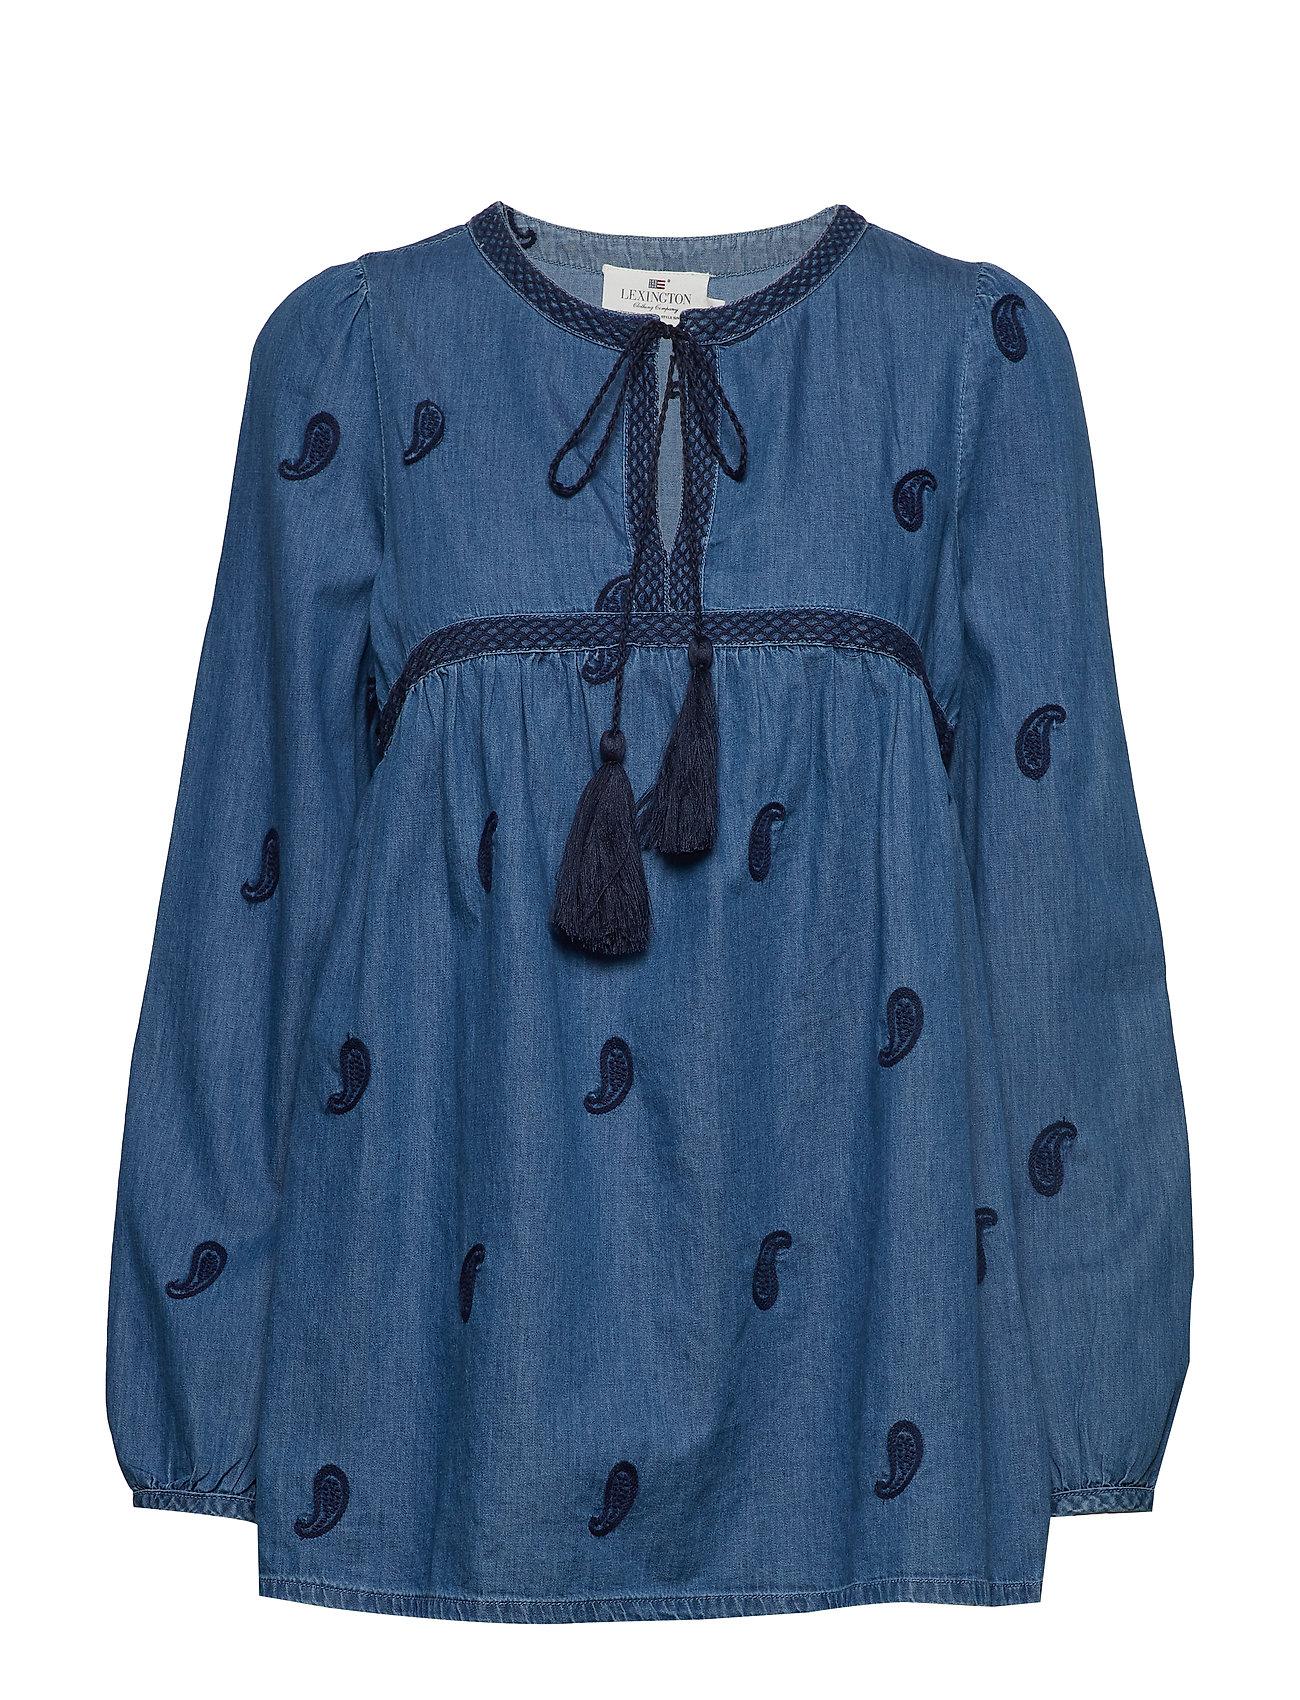 Lexington Clothing Freya Embroidery Blouse - MEDIUM BLUE DENIM